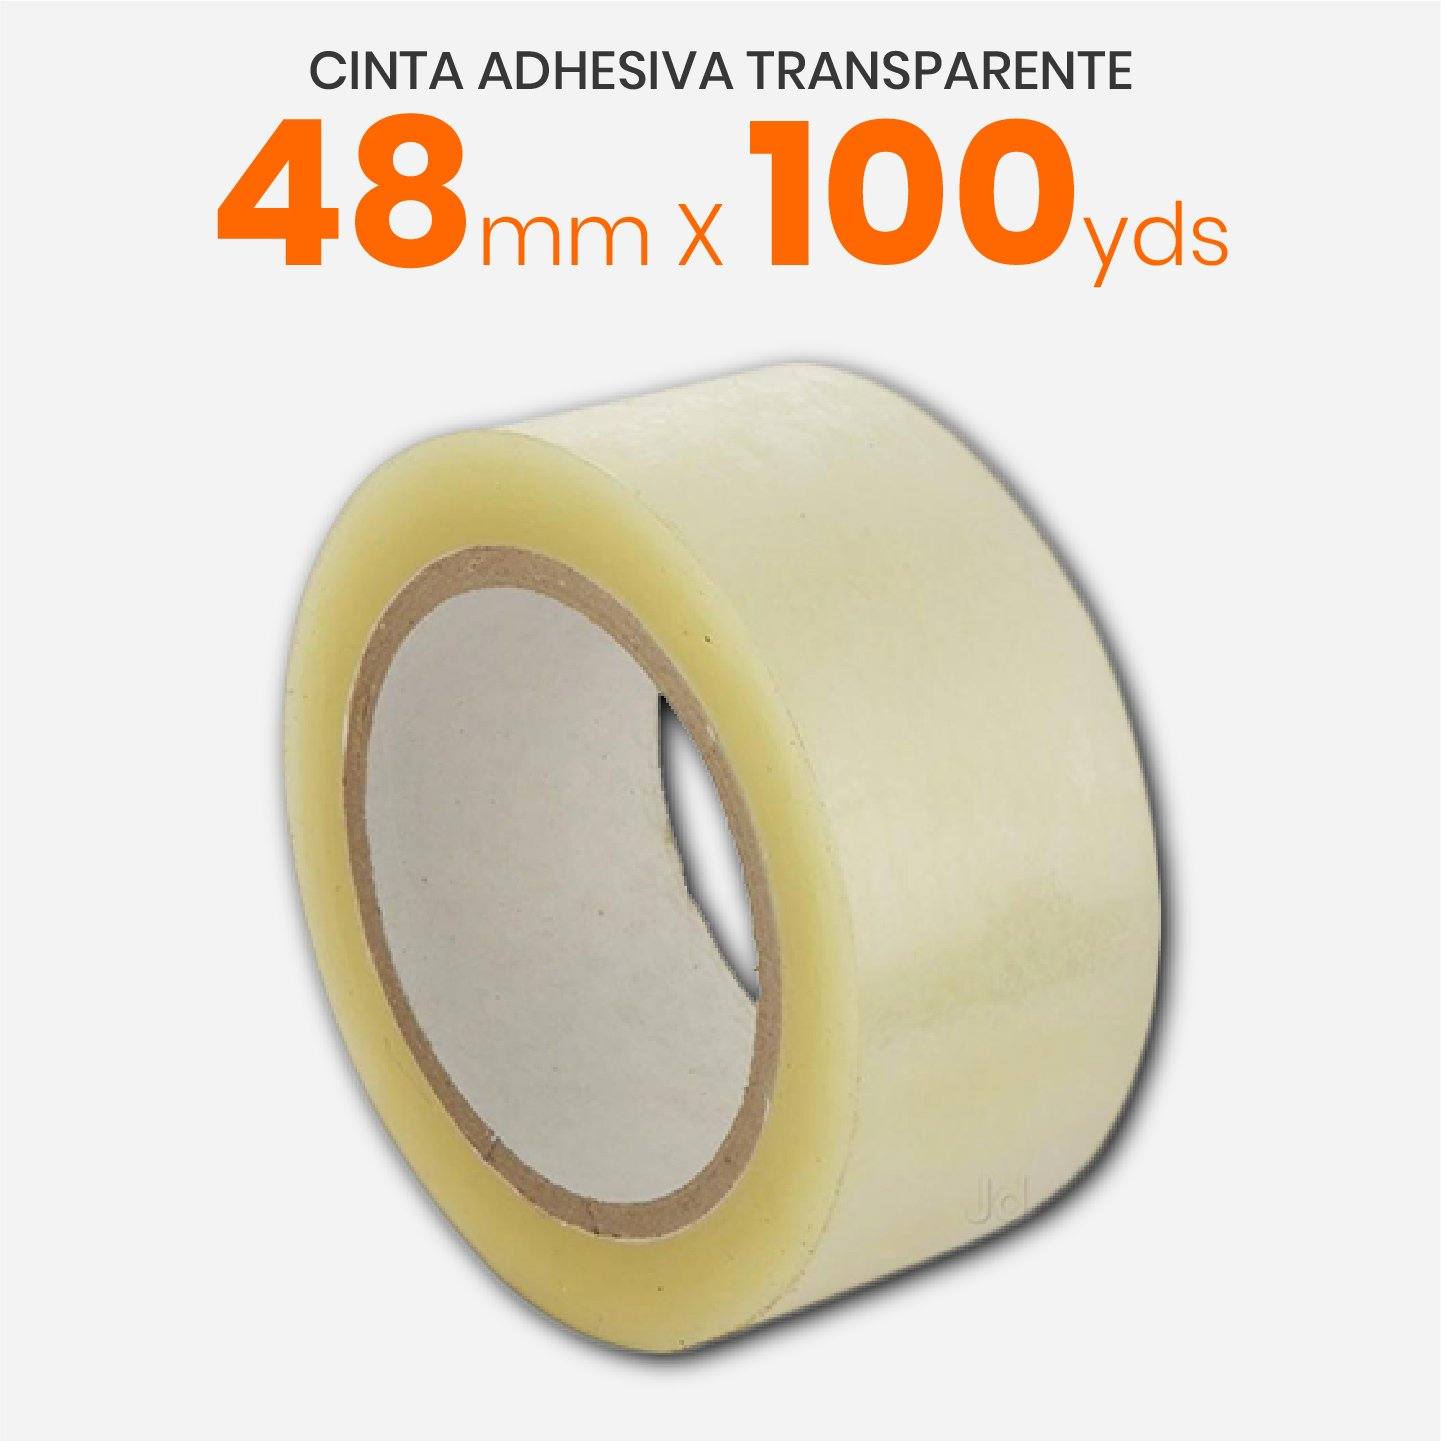 Cinta Adhesiva Transparente 48mm x 100yds